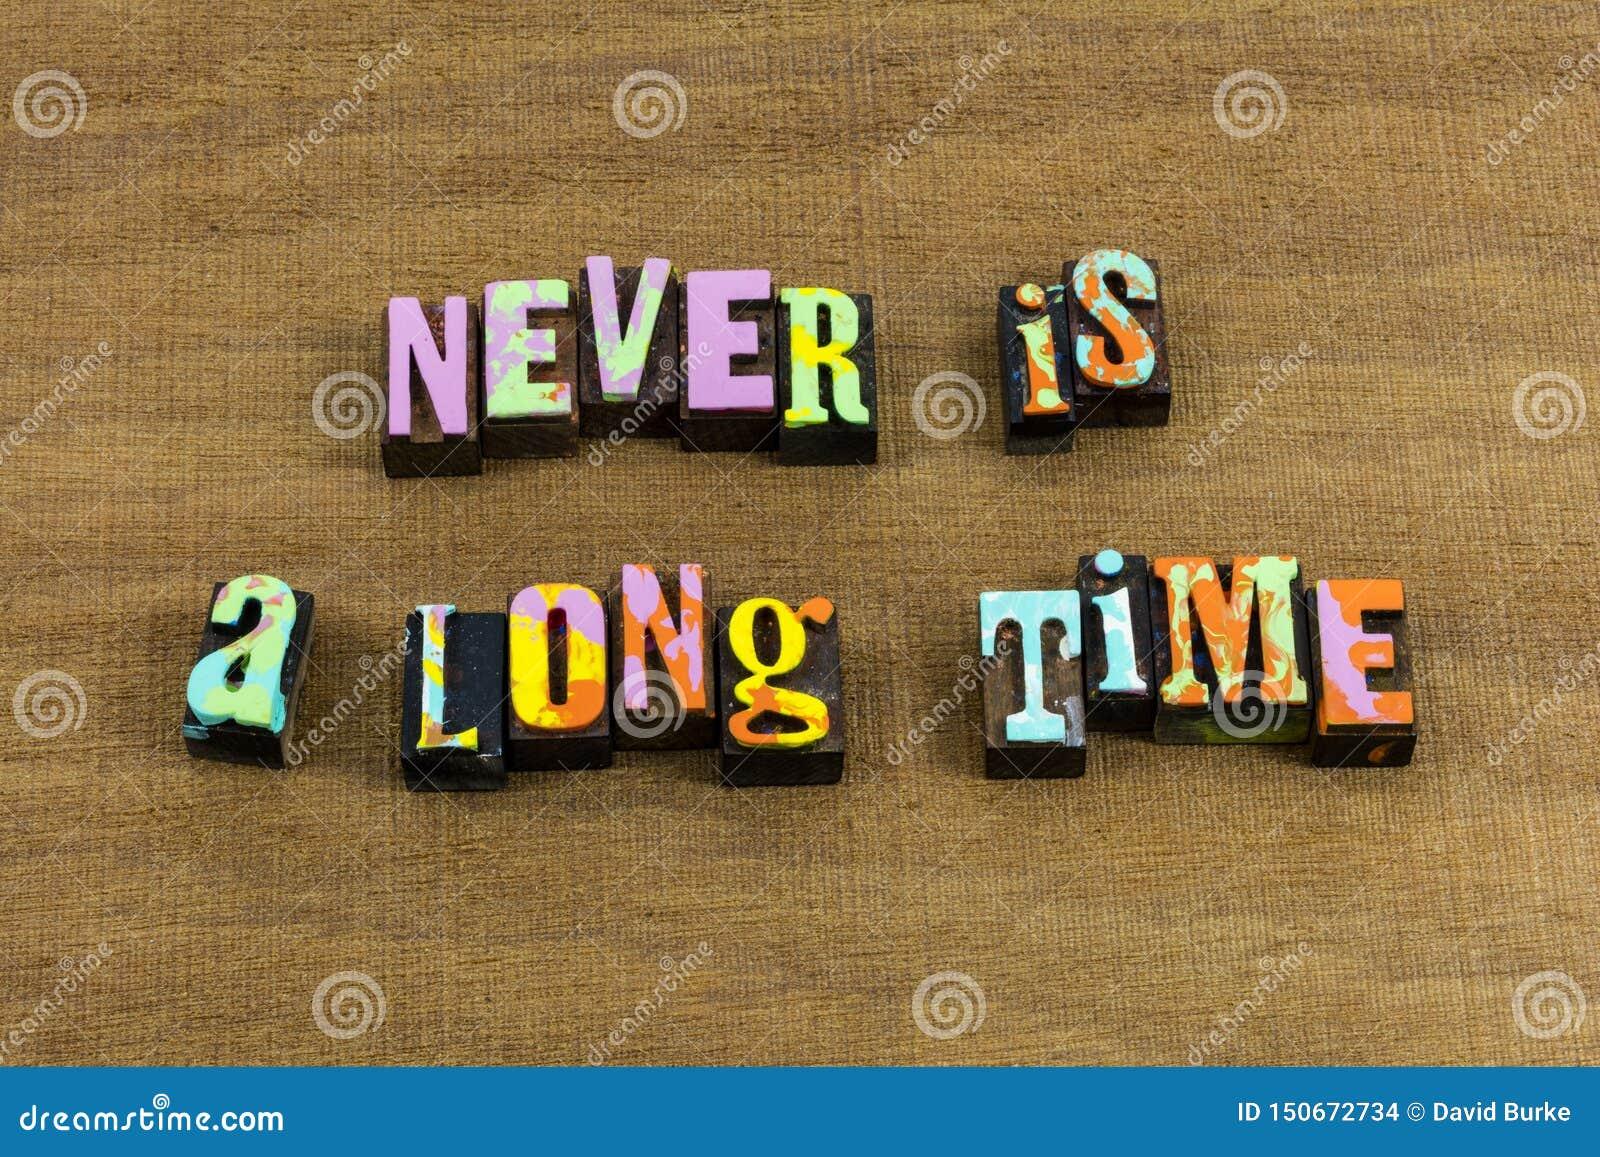 Never long time term goal plan planning short